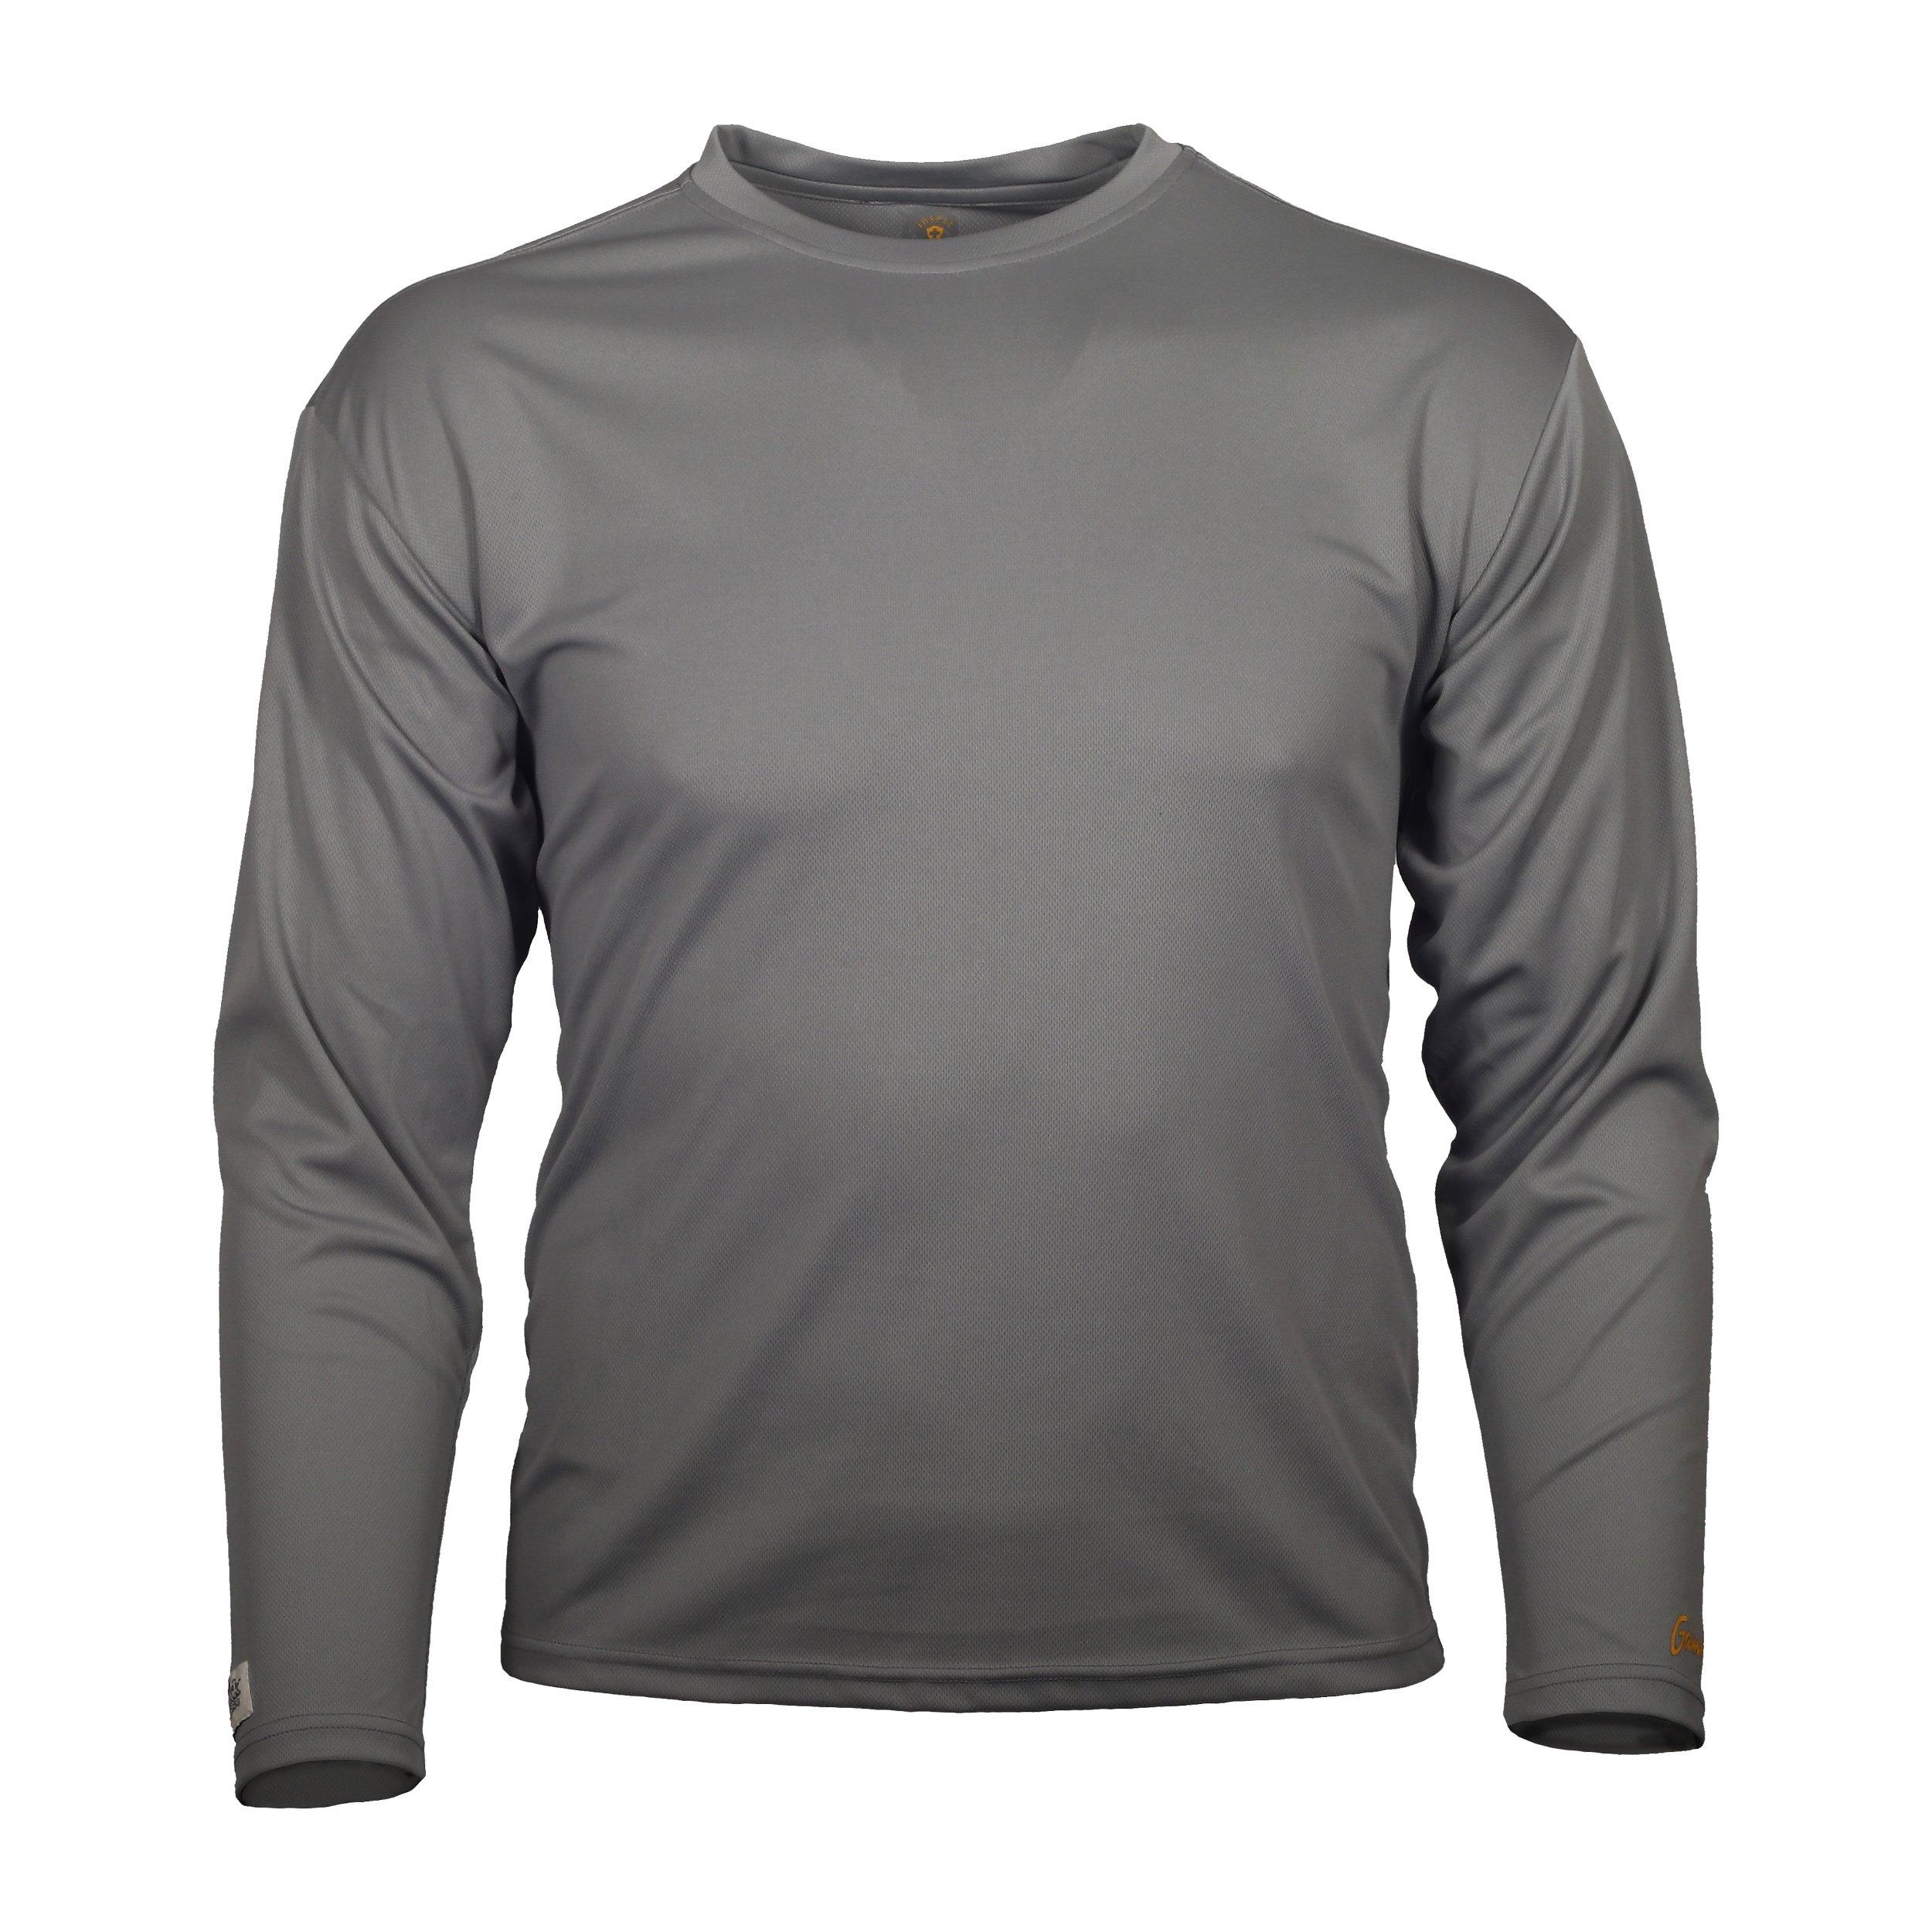 Gamehide ElimiTick Long Sleeve Tech Shirt (Slate Grey, 3X) by Gamehide